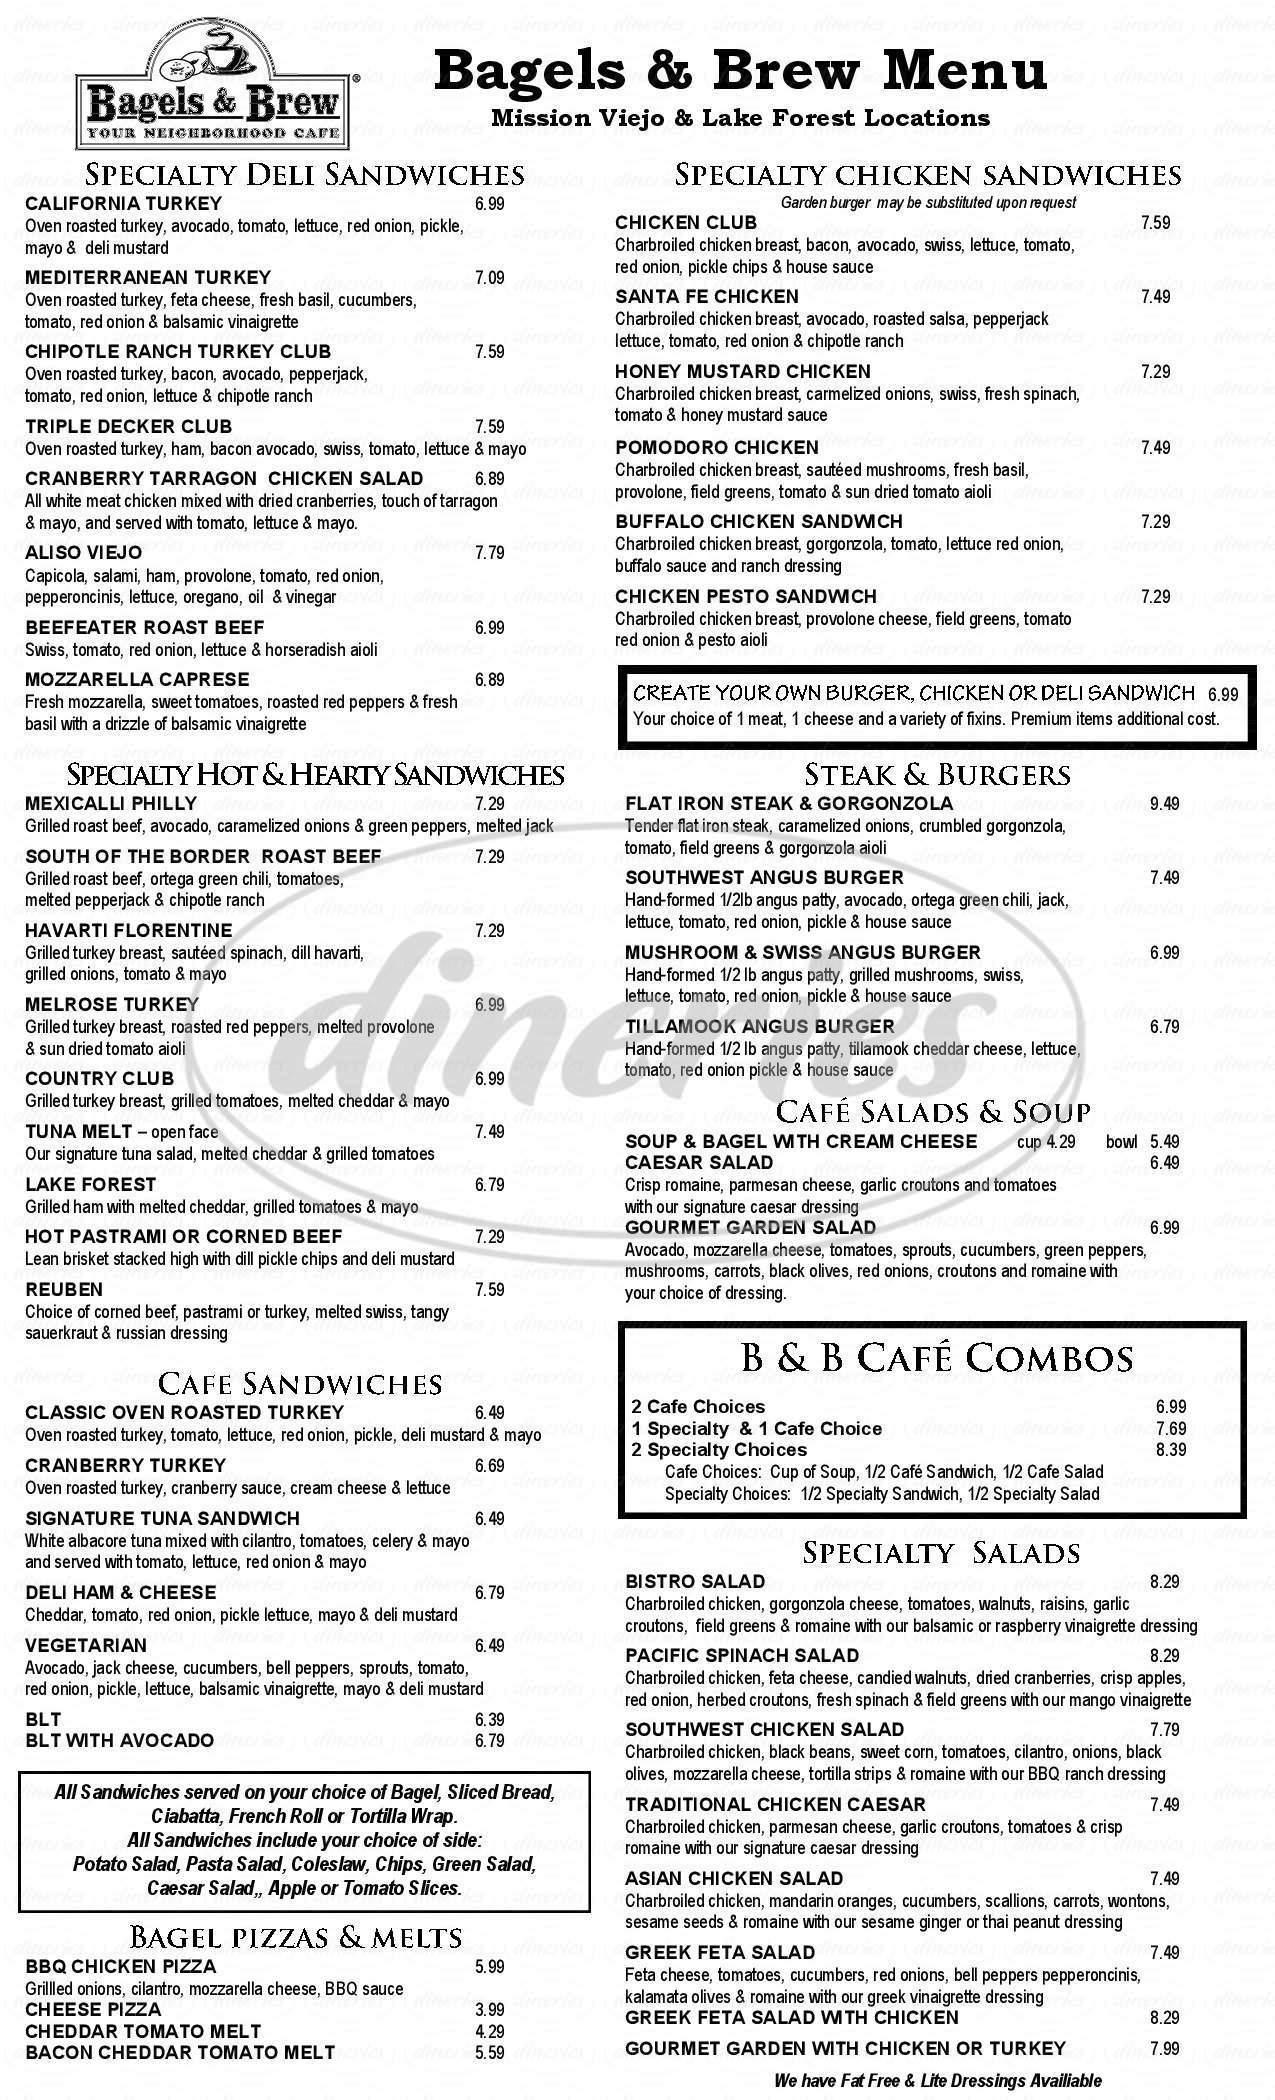 menu for Bagels & Brew